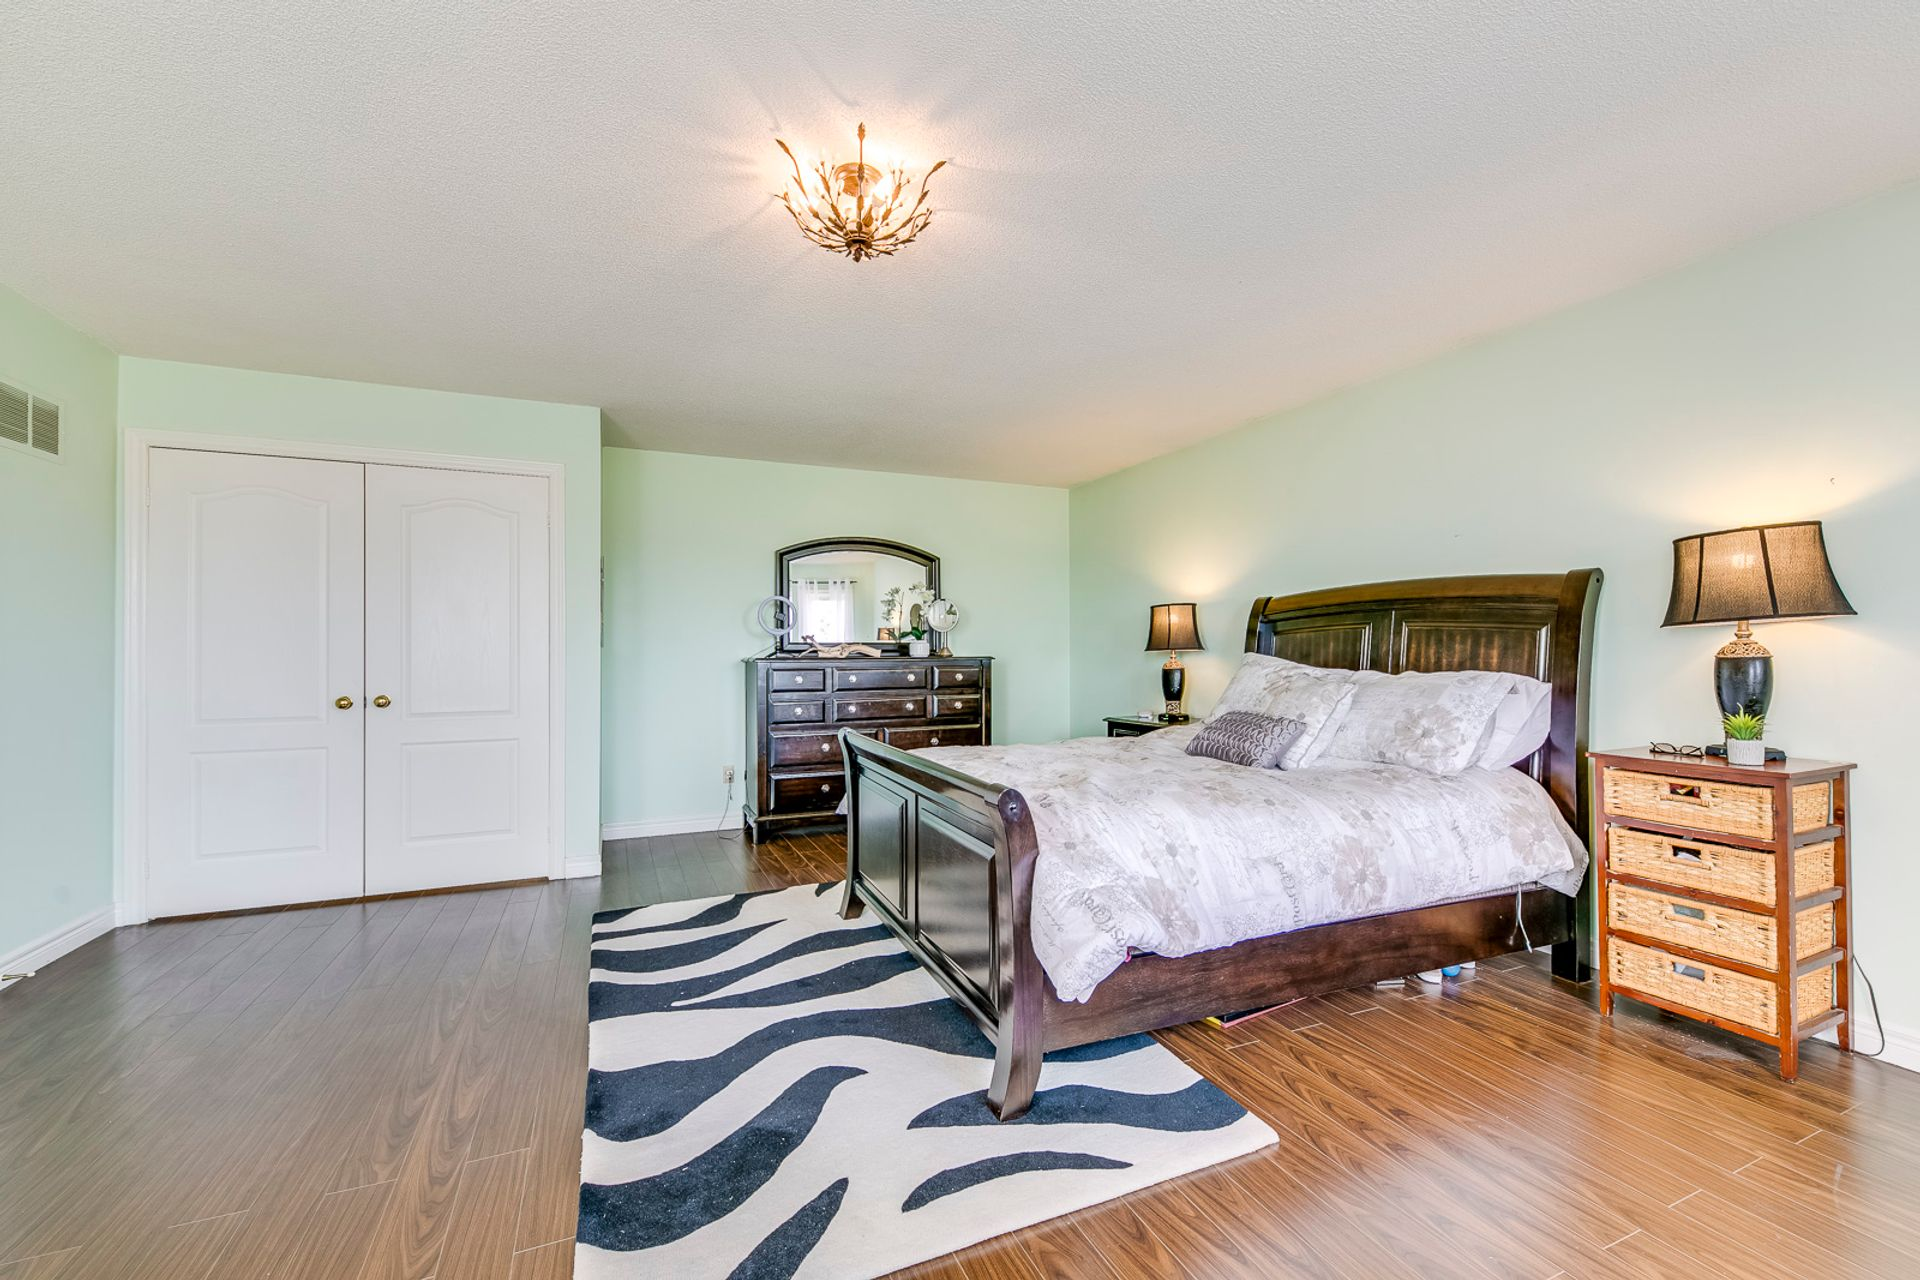 Master Bedroom - 972 Winterton Way, Mississauga - Elite3 & Team at 972 Winterton Way, East Credit, Mississauga